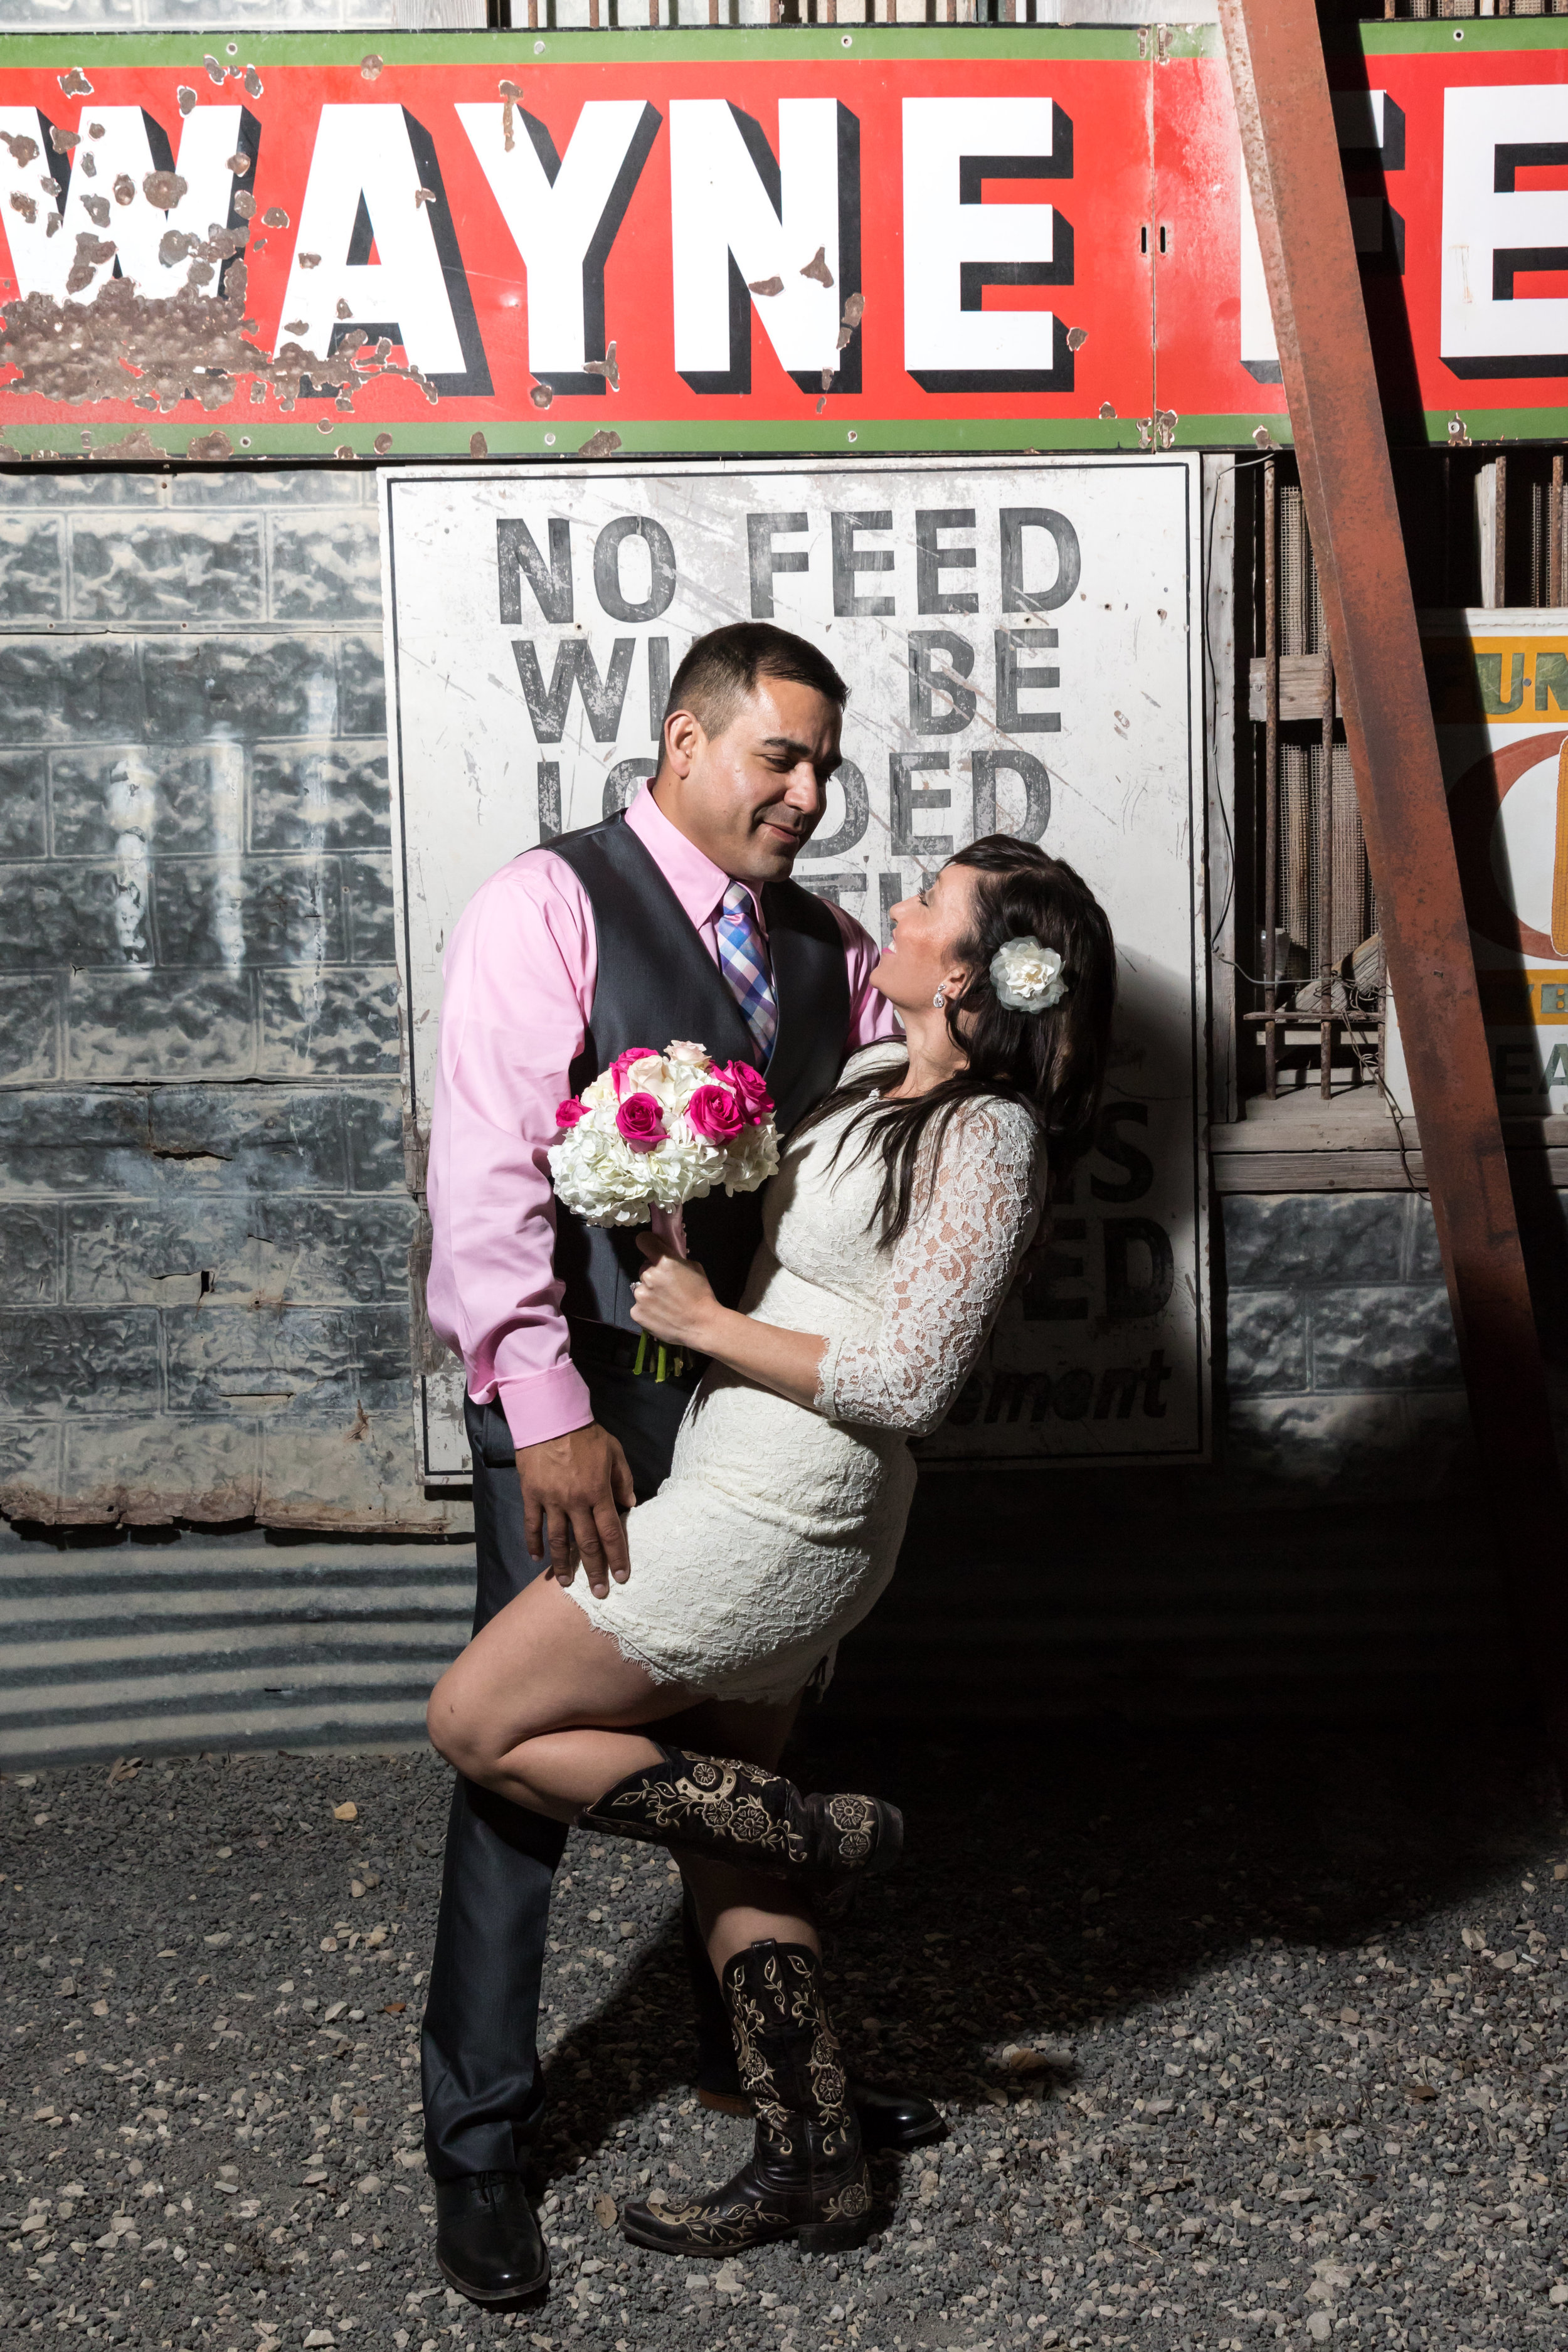 Reve Wedding-9829.jpg